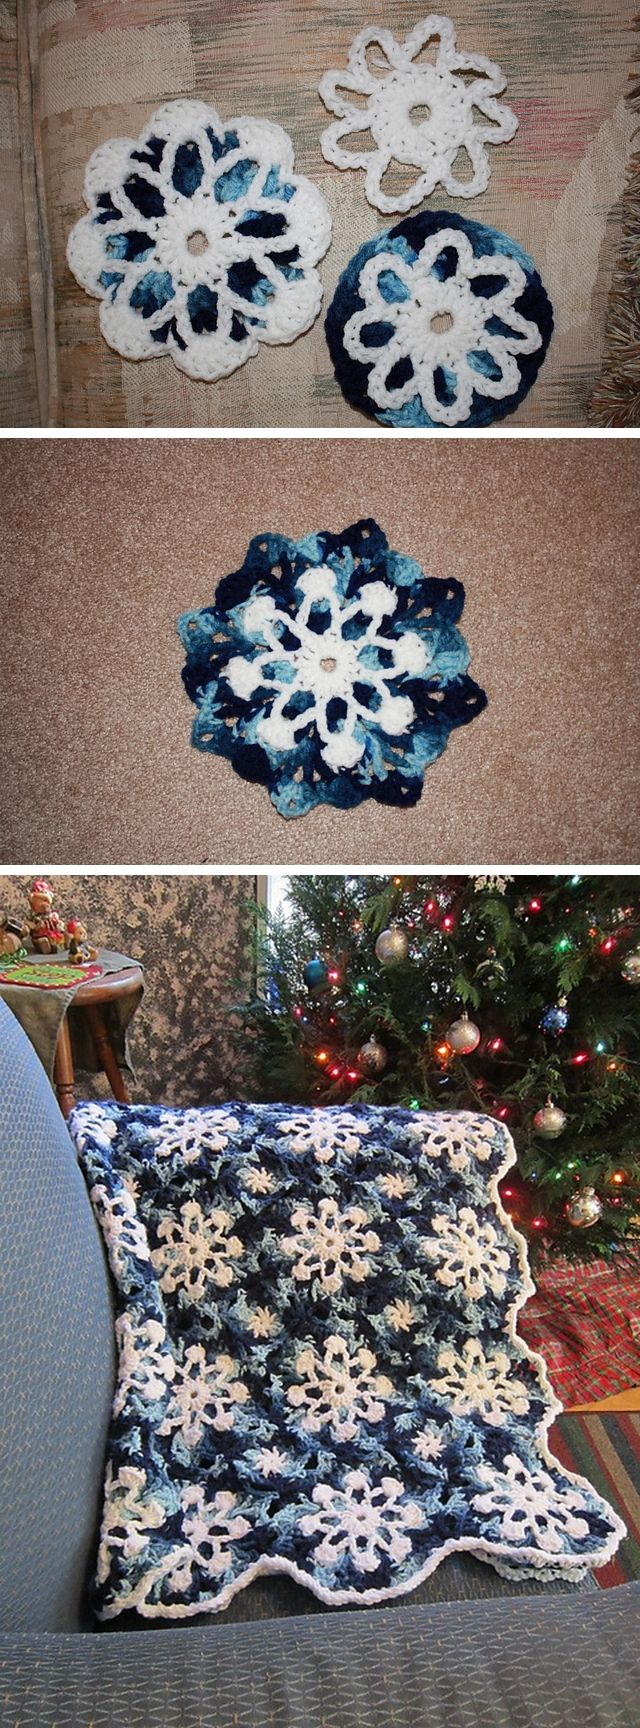 Gorgeous Dusty Snowflakes Throw - Free Crochet Pattern ❥Teresa Restegui http://www.pinterest.com/teretegui/❥